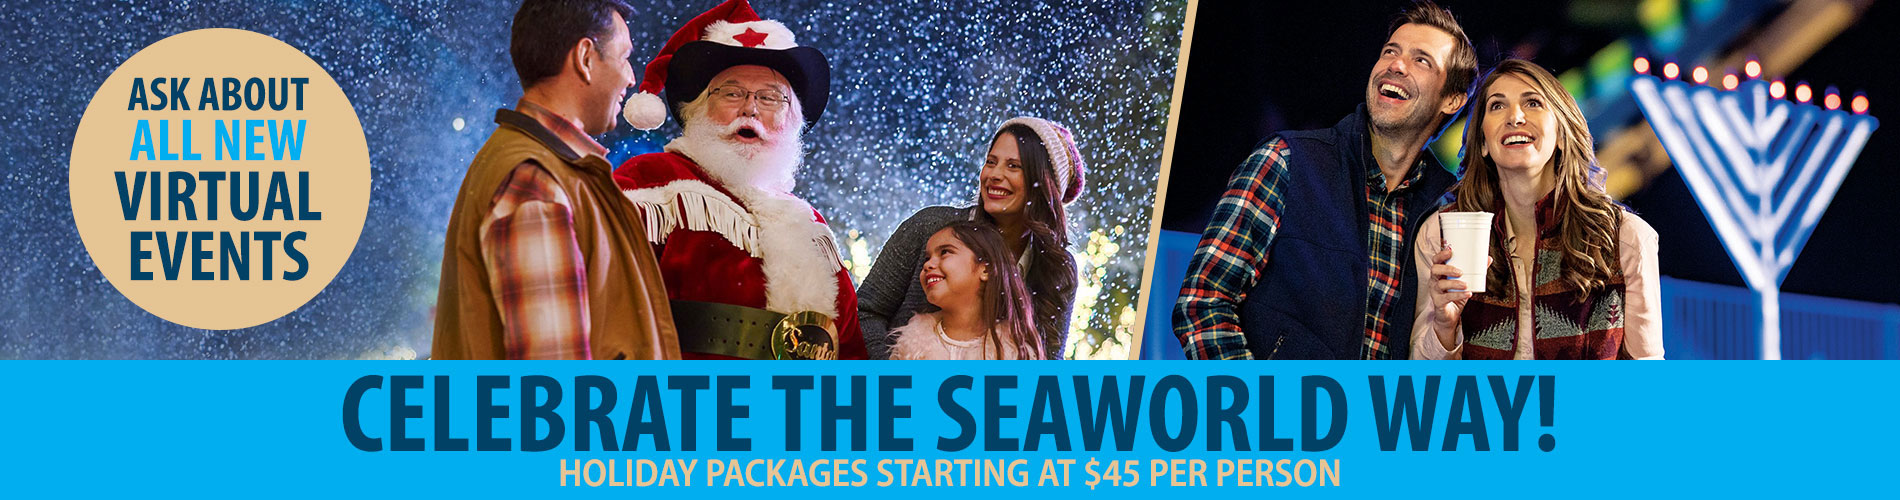 Celebrate the SeaWorld Way